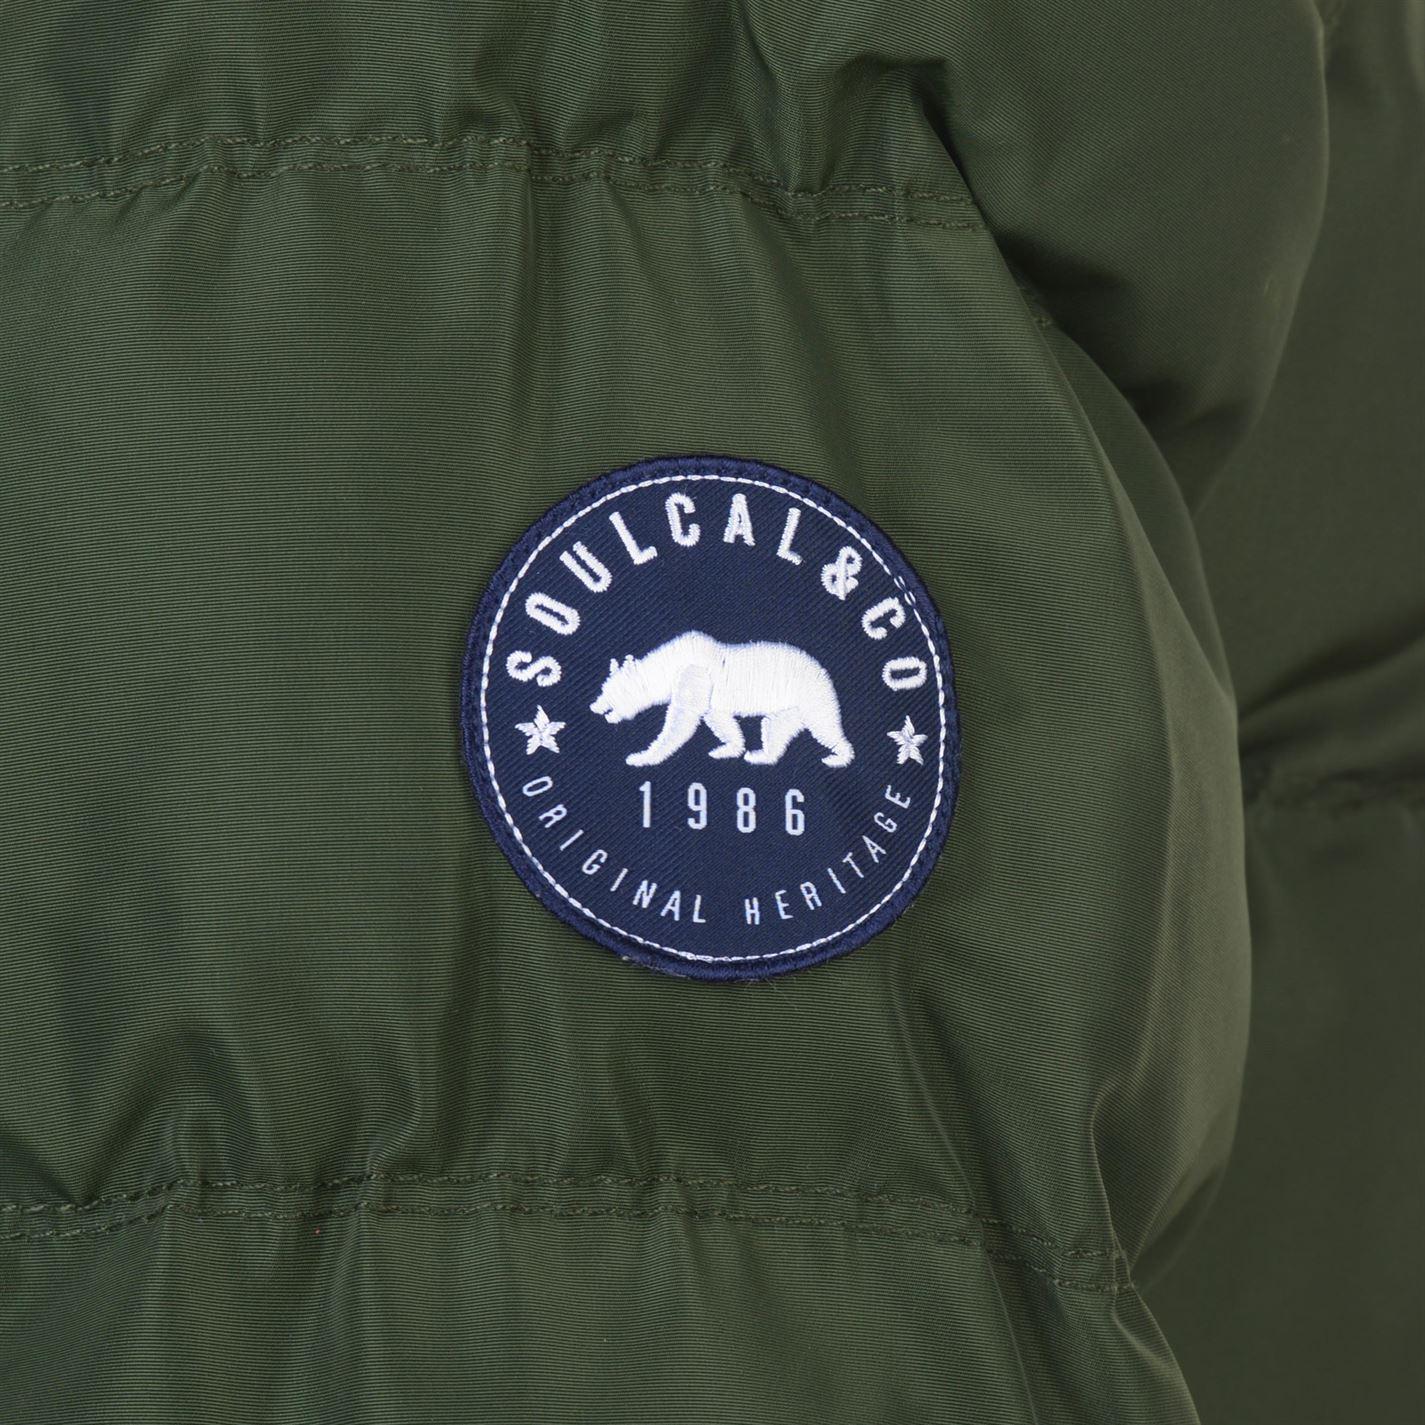 Mens-SoulCal-2-Zip-Bubble-Jacket-Padded-New thumbnail 17